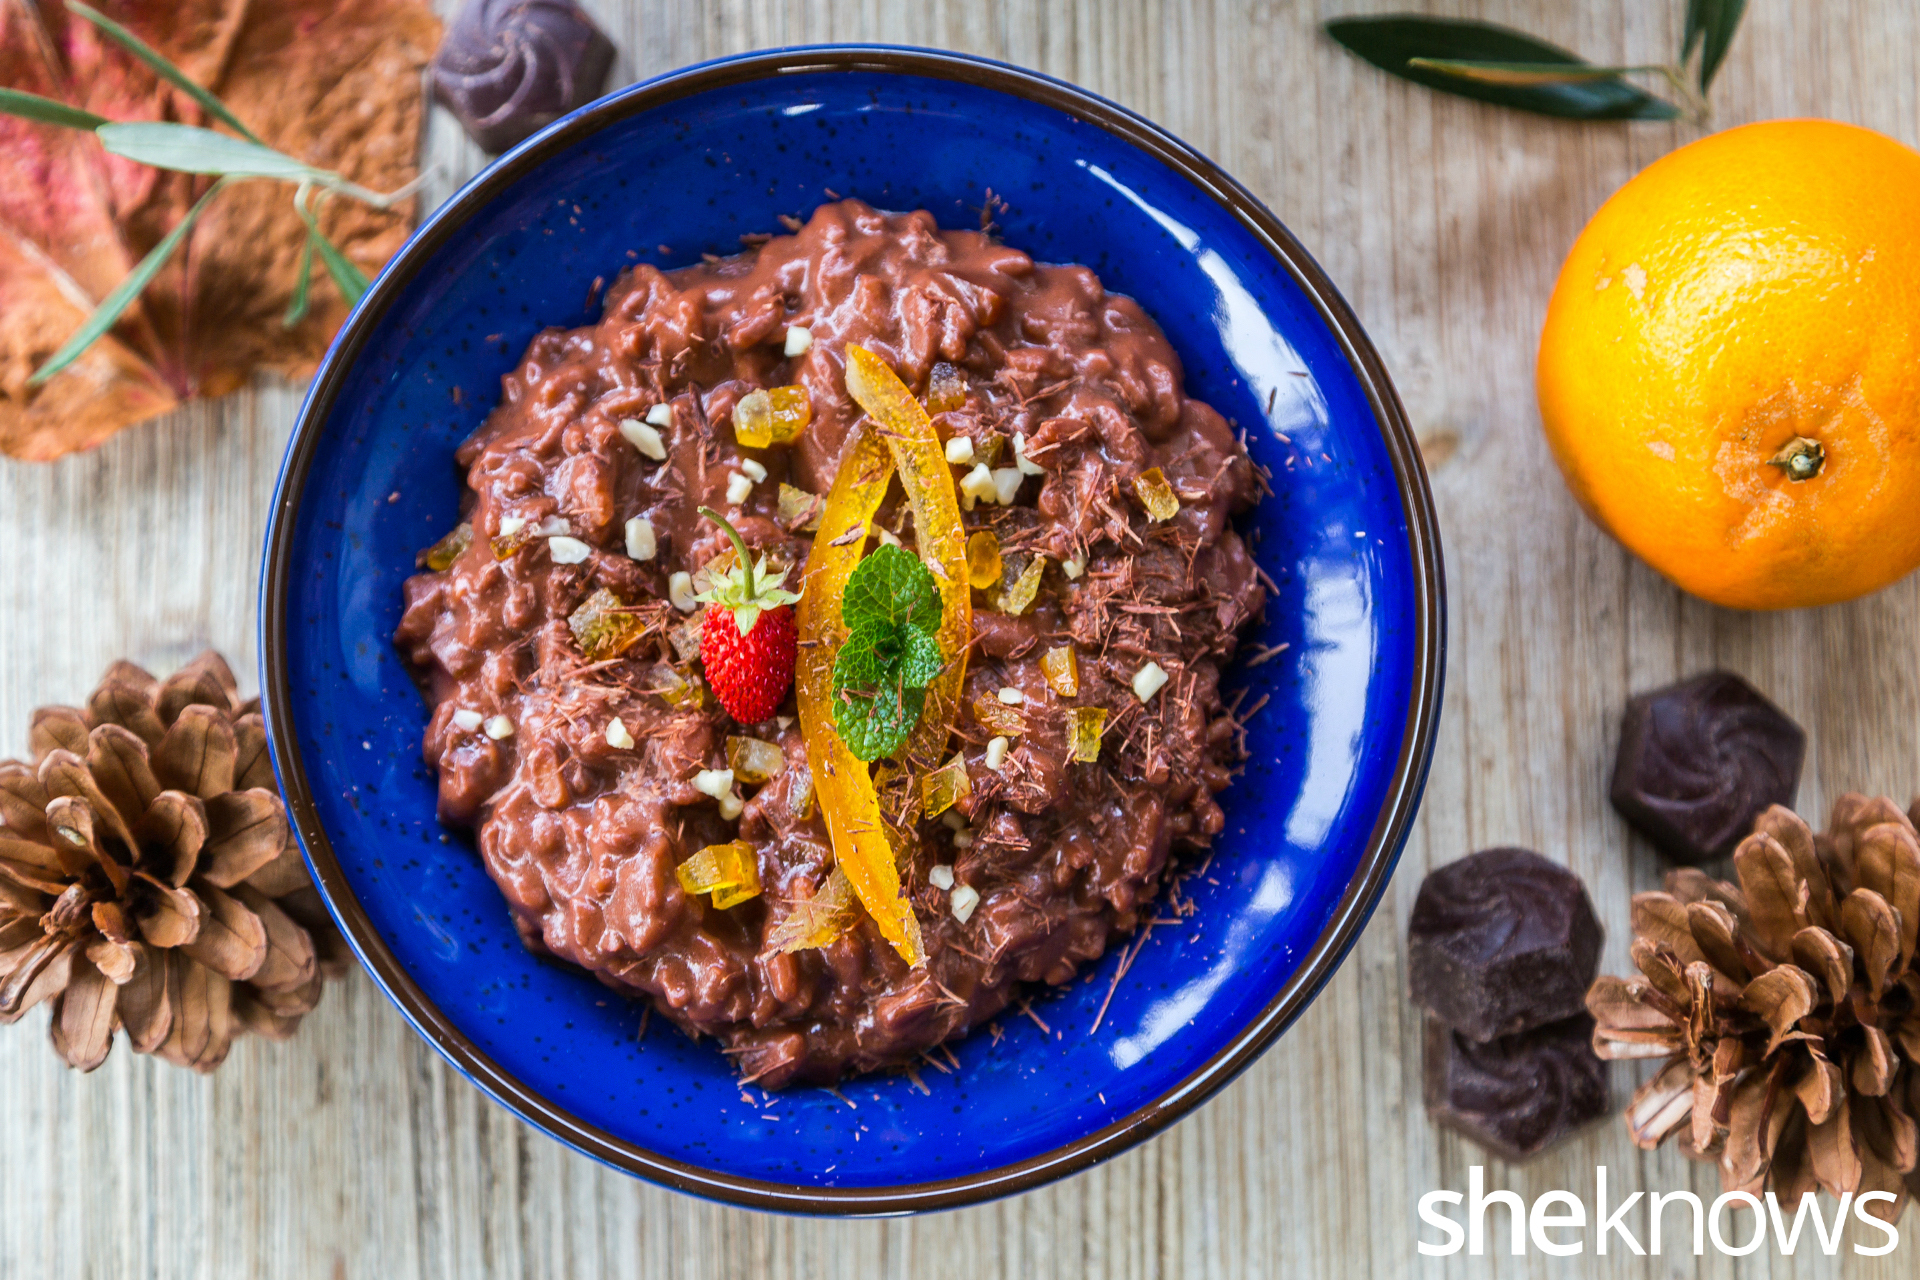 Dark-chocolate-rice-pudding-with-orange-peel